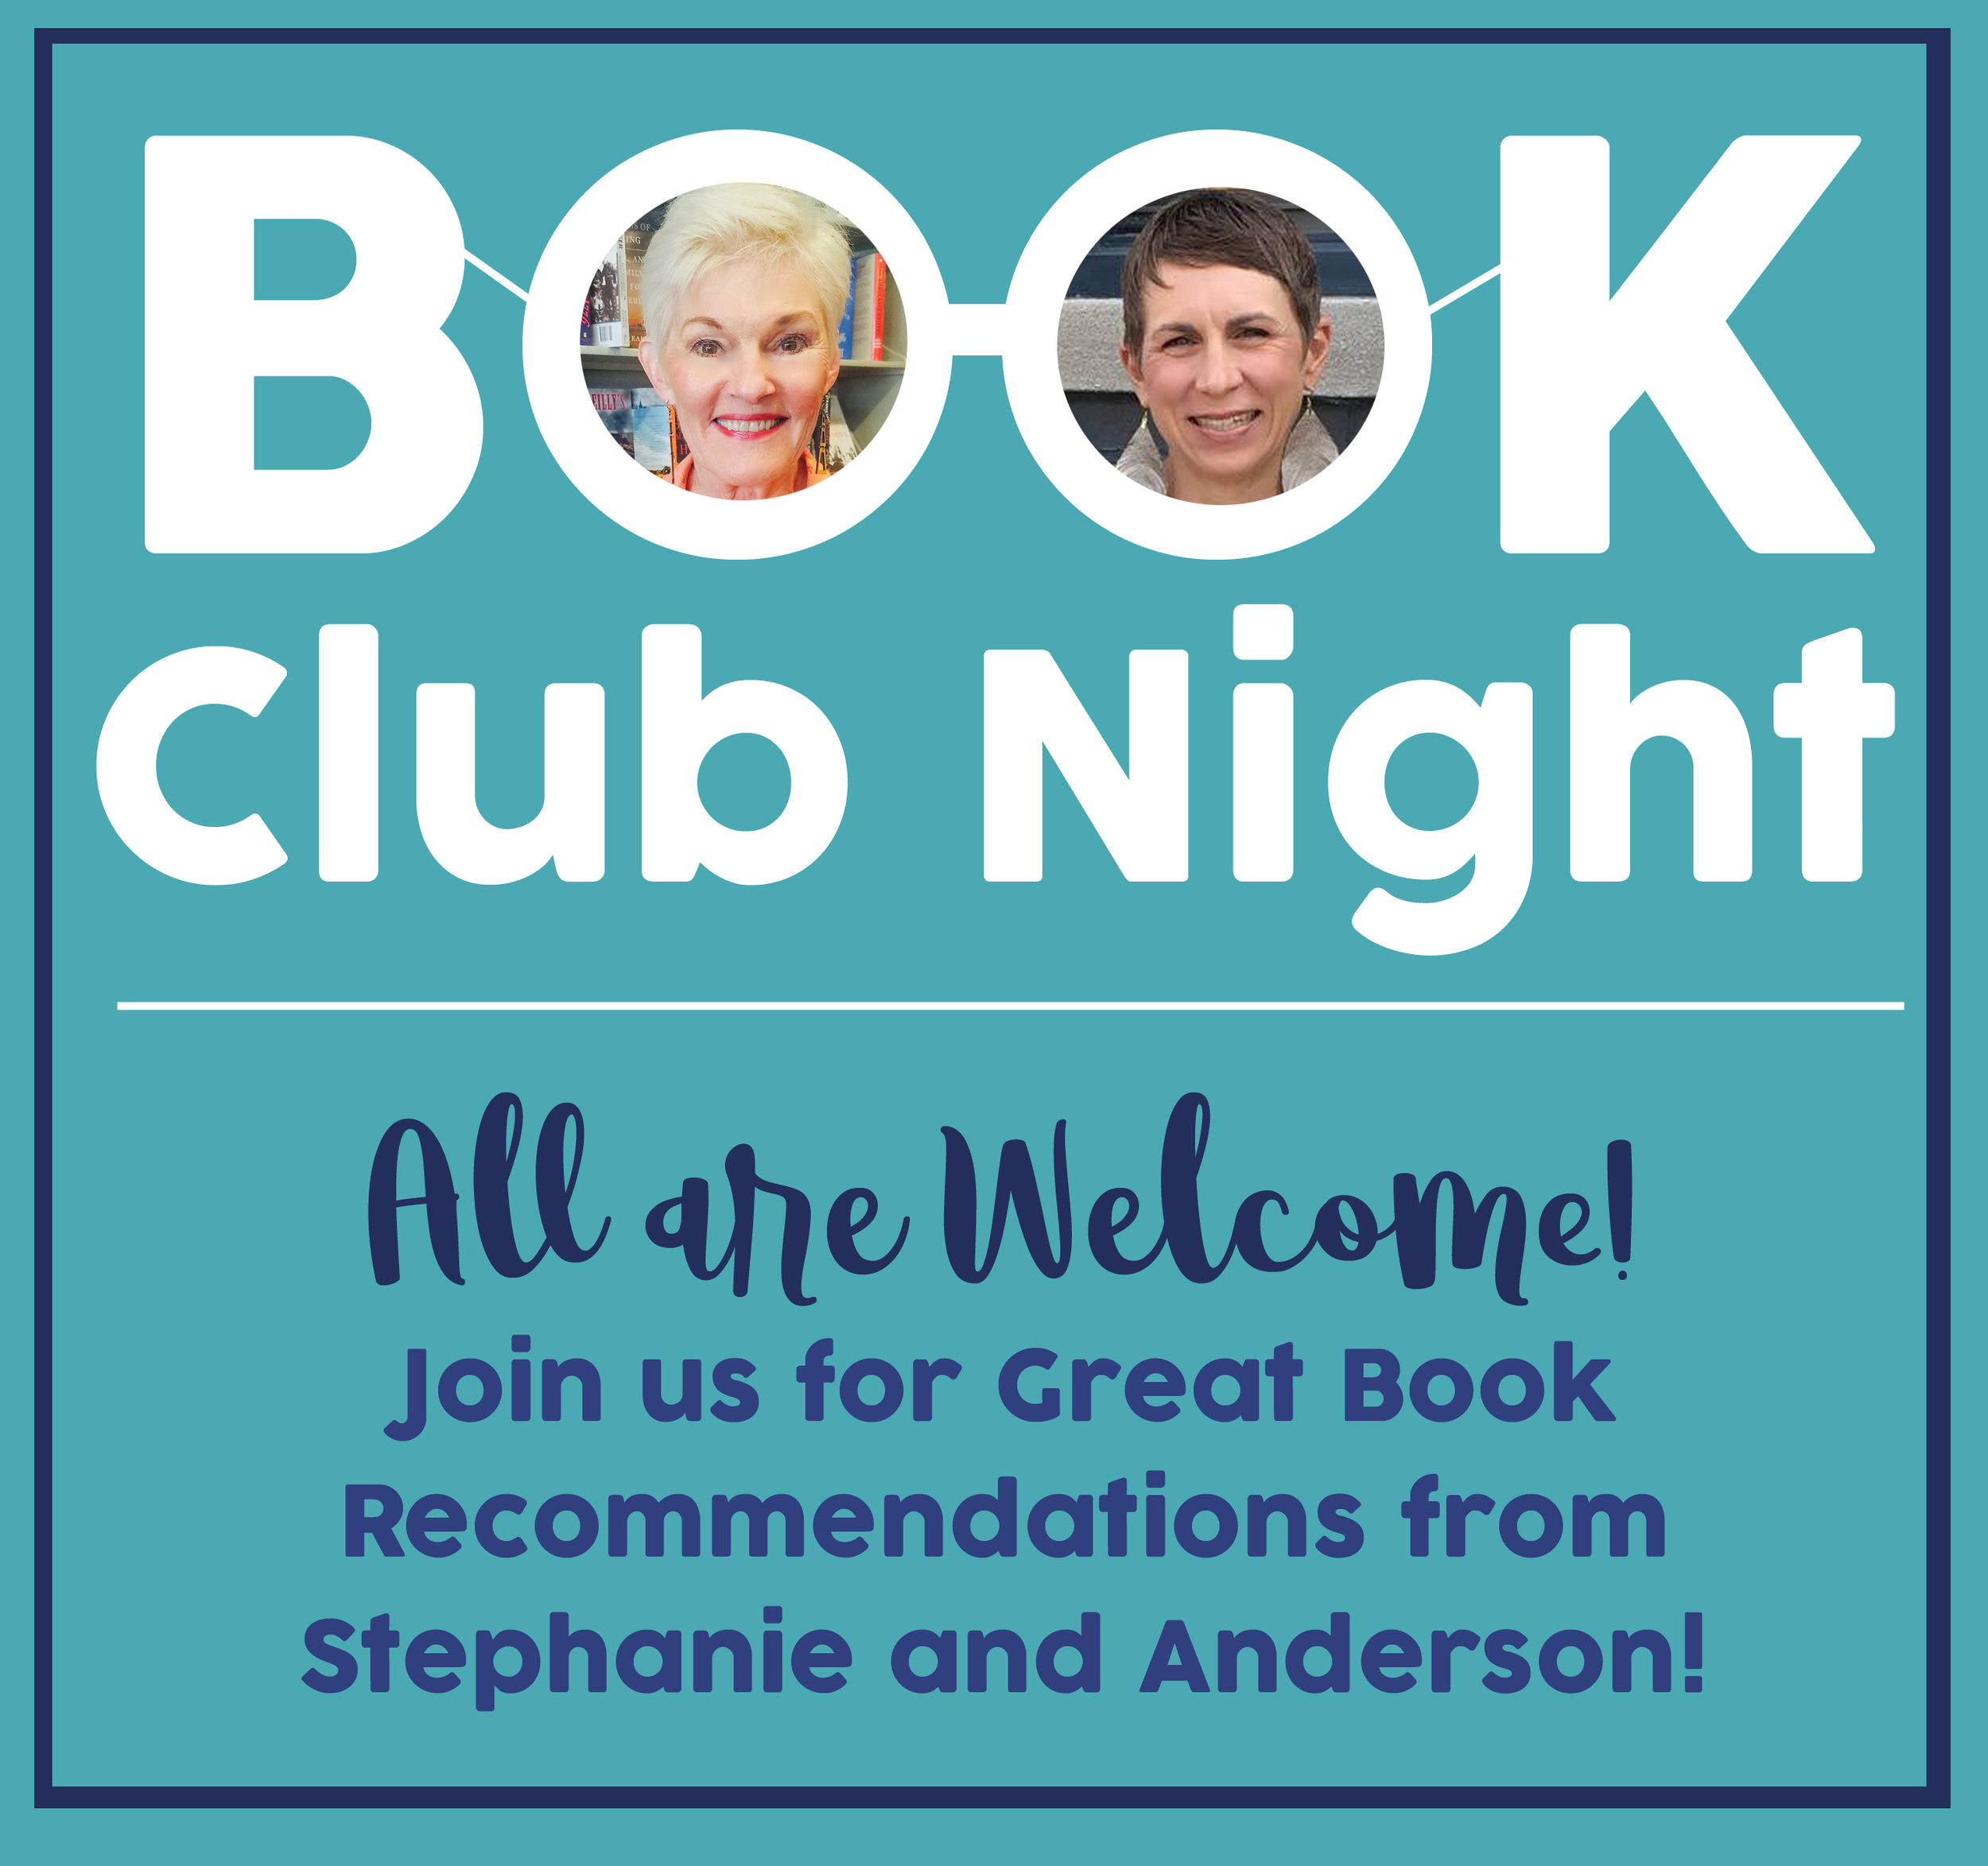 book club copy 2.jpg